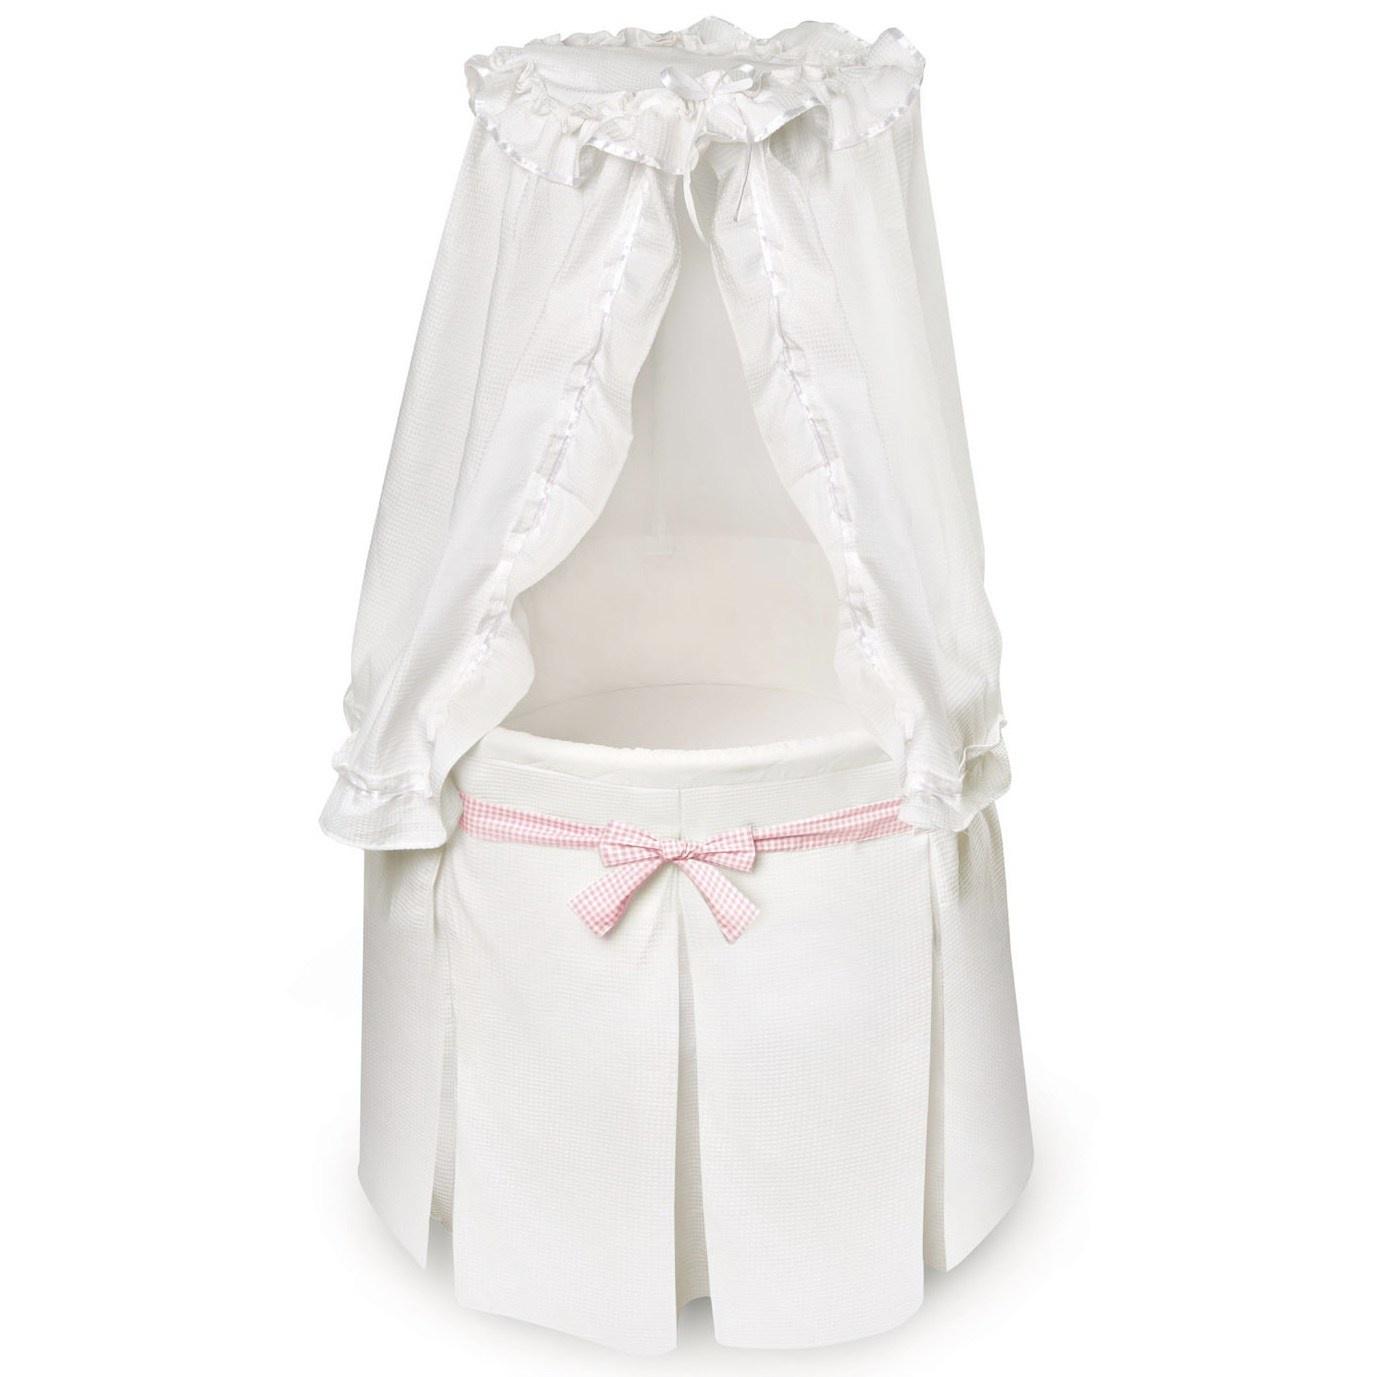 Колыбель Giovanni Solo White/Pink колыбель giovanni shapito solo white pink